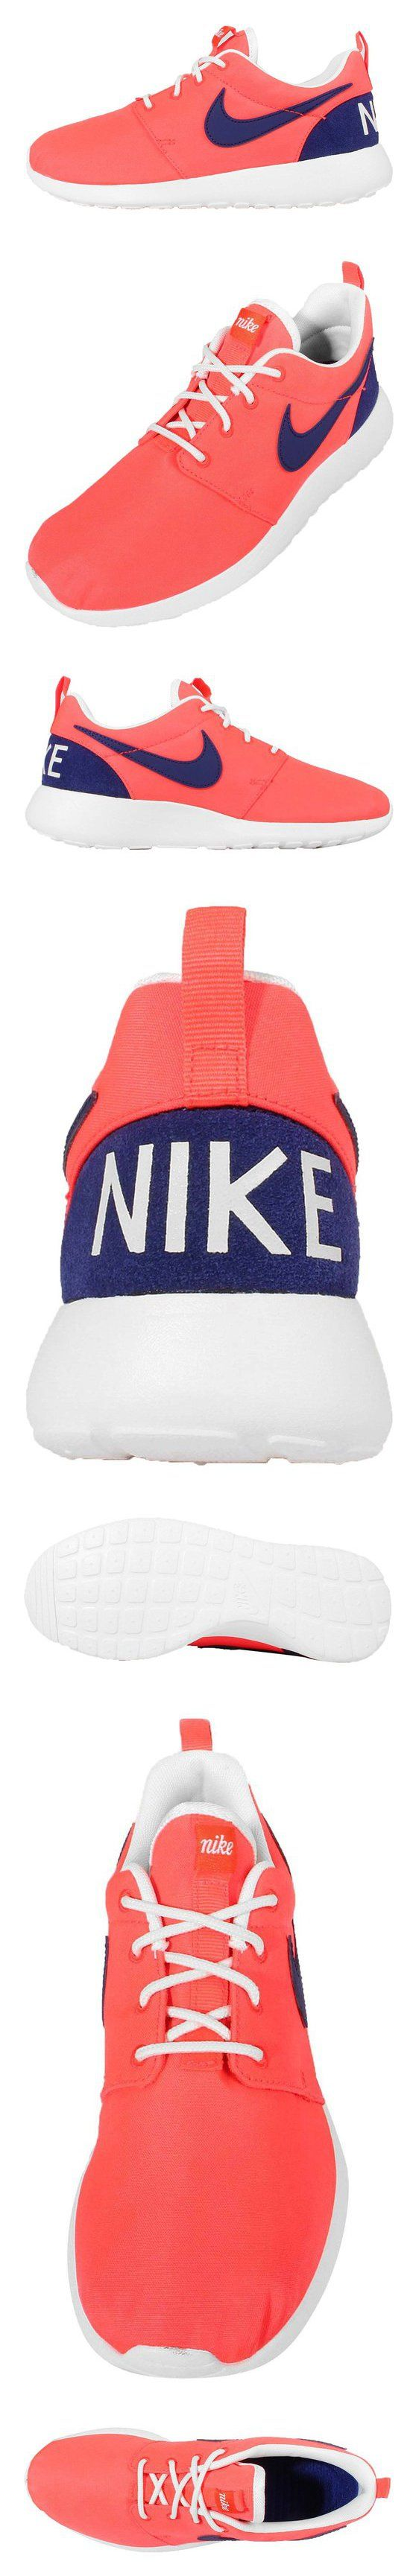 $129.99 - Nike Women's Wmns Roshe One Retro  BRIGHT CRIMSON/LOYAL BLUE-SAIL-BLACK #shoes #nike #2016